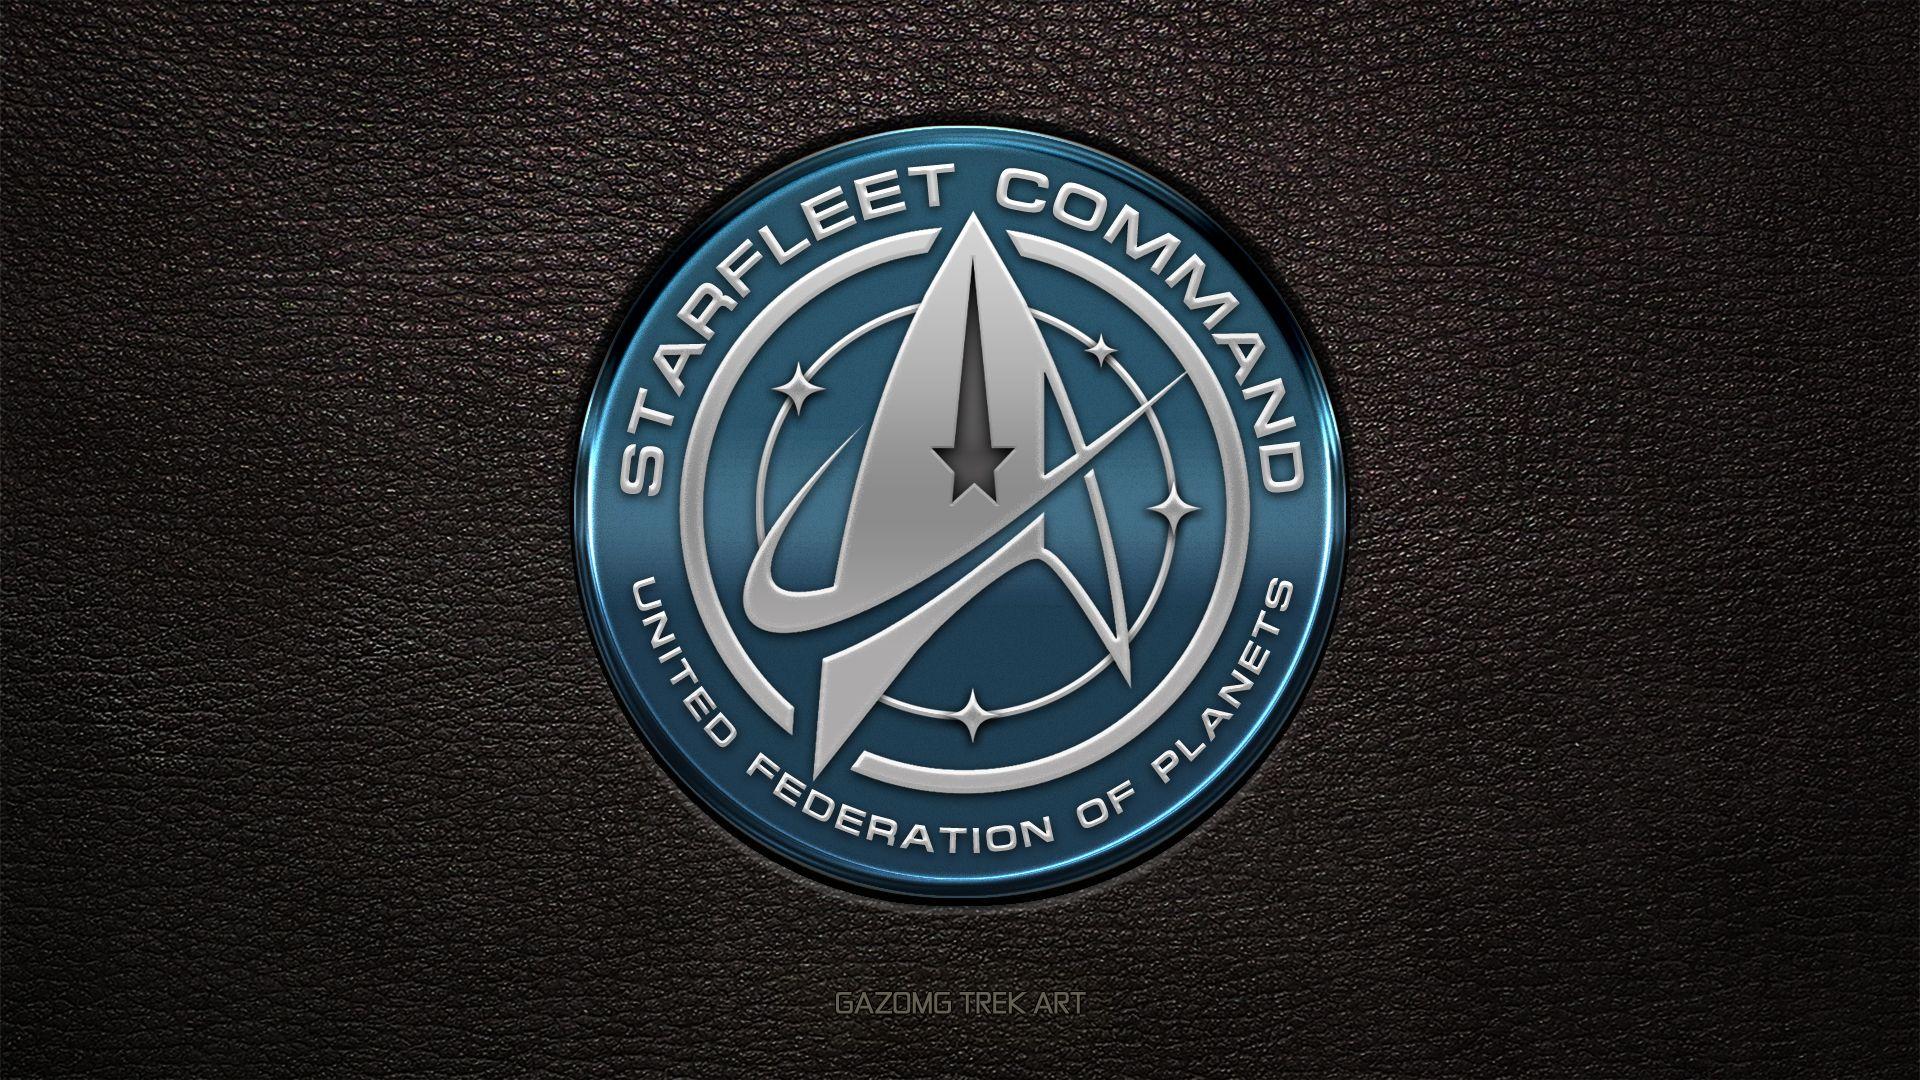 New Star Trek Uss Discovery Starfleet Command Logo By Gazomg Star Trek Art Star Trek Wallpaper Star Trek Logo